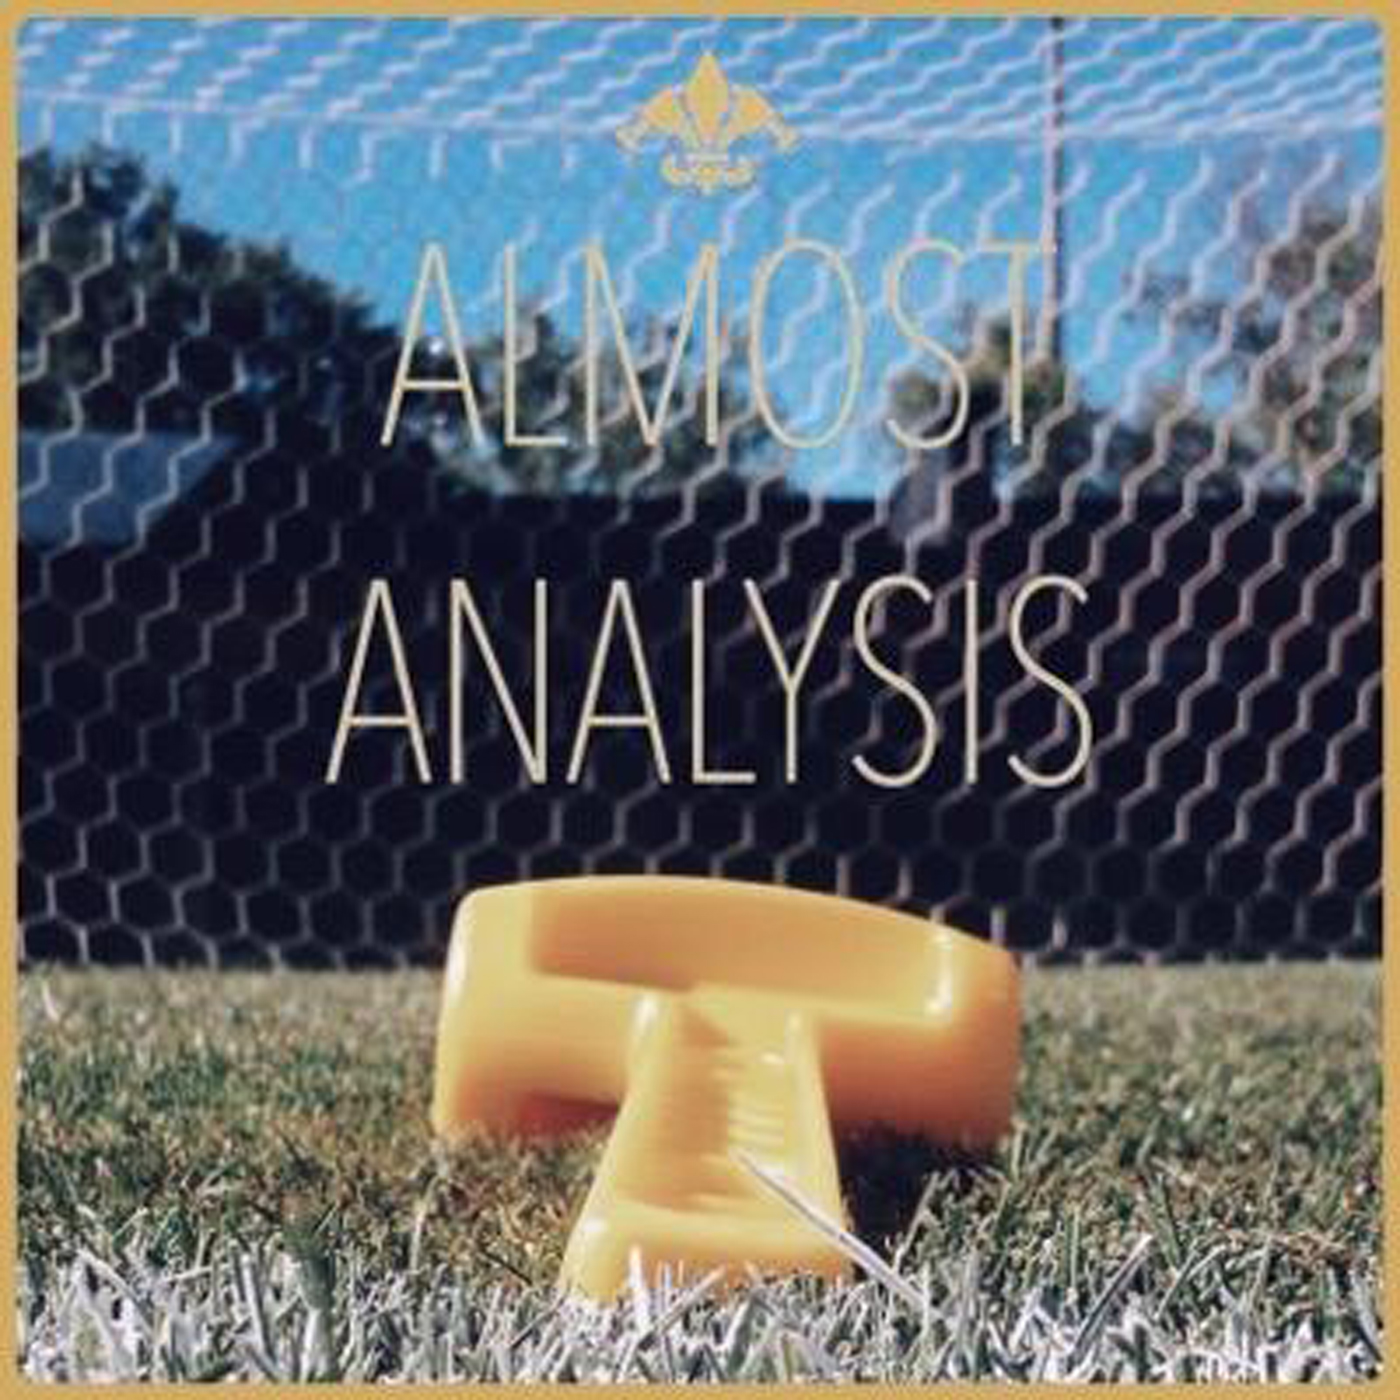 AlmostAnalysis